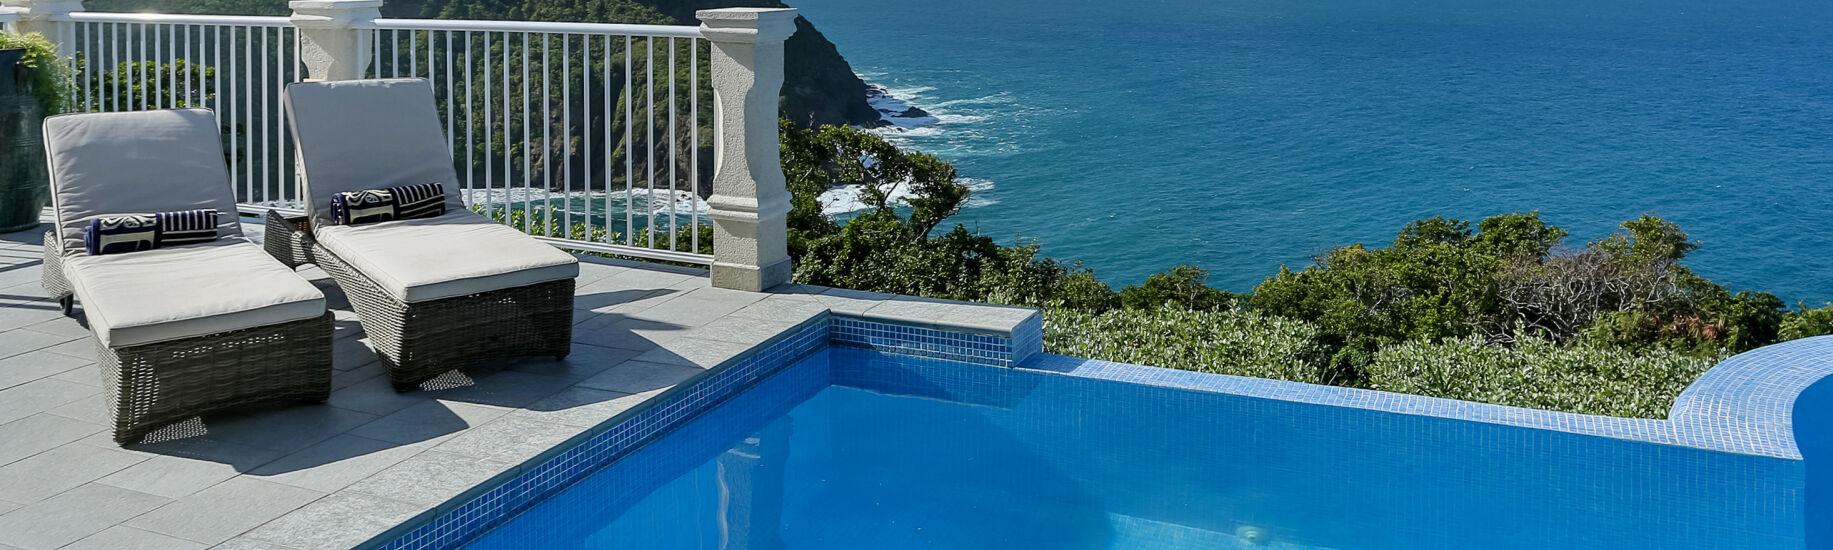 Elegant Resorts Contact Us